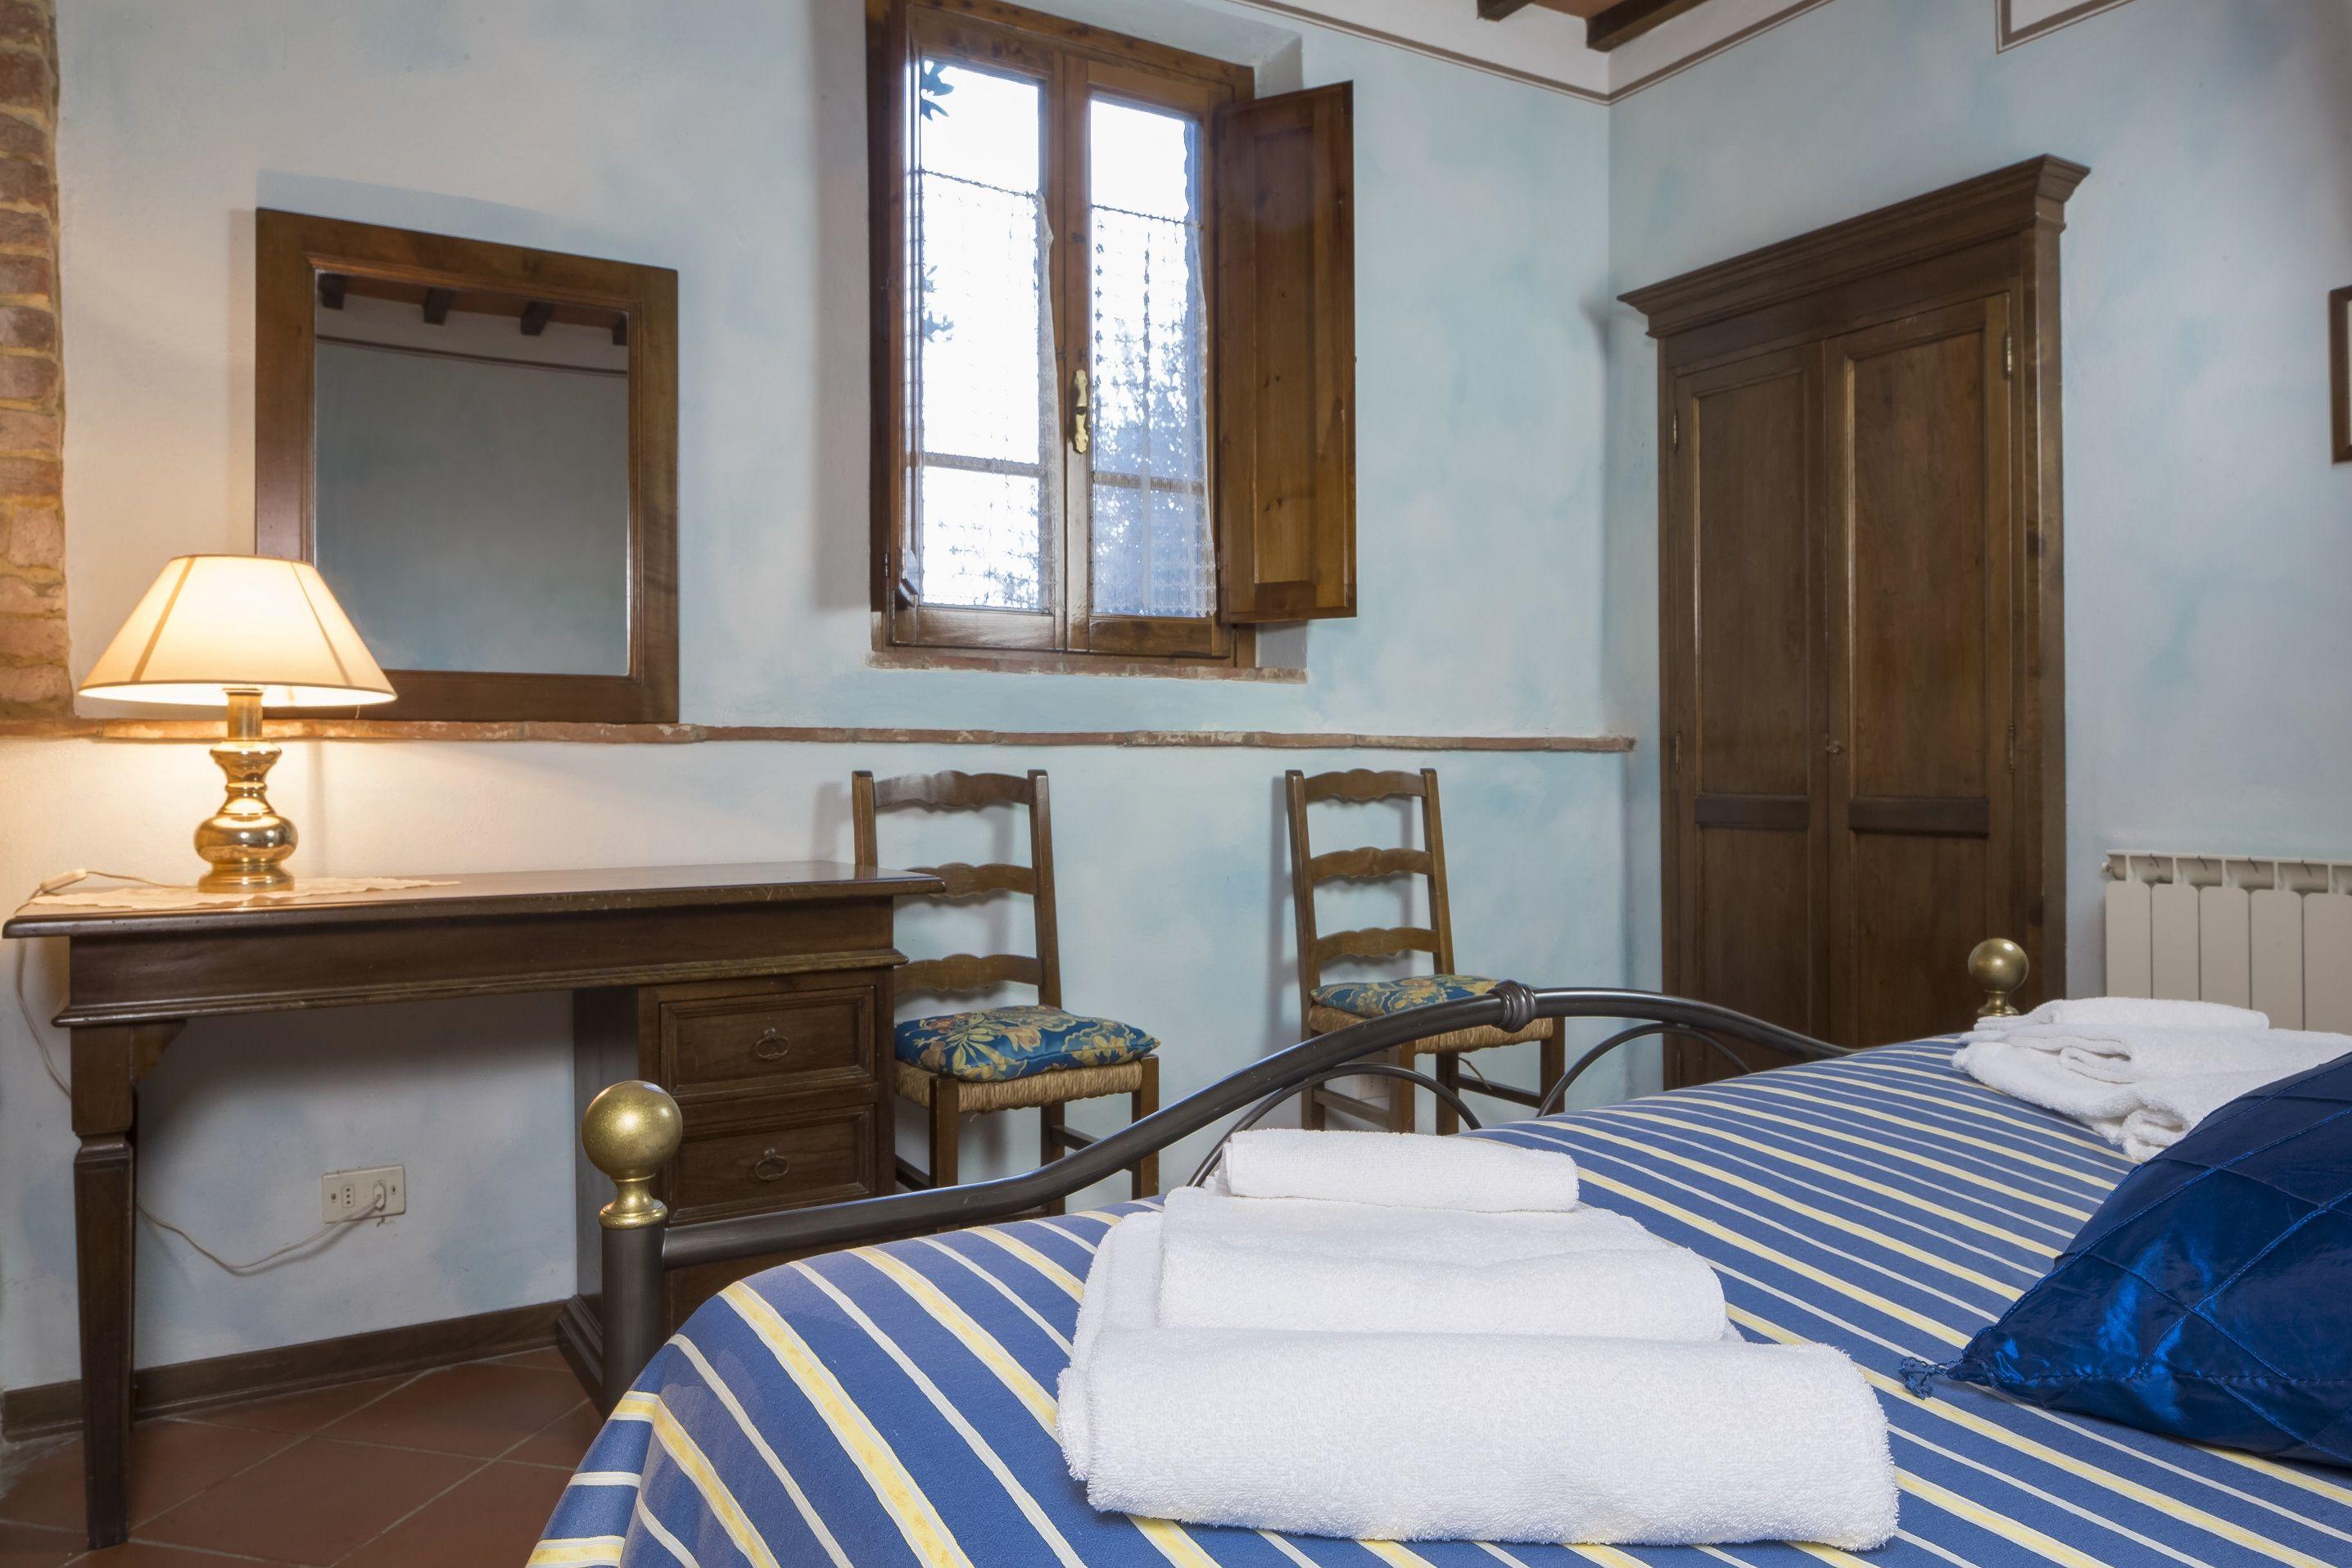 Apartment Agriturismo Il Sapito - Rossini Holiday Home photo 16678373